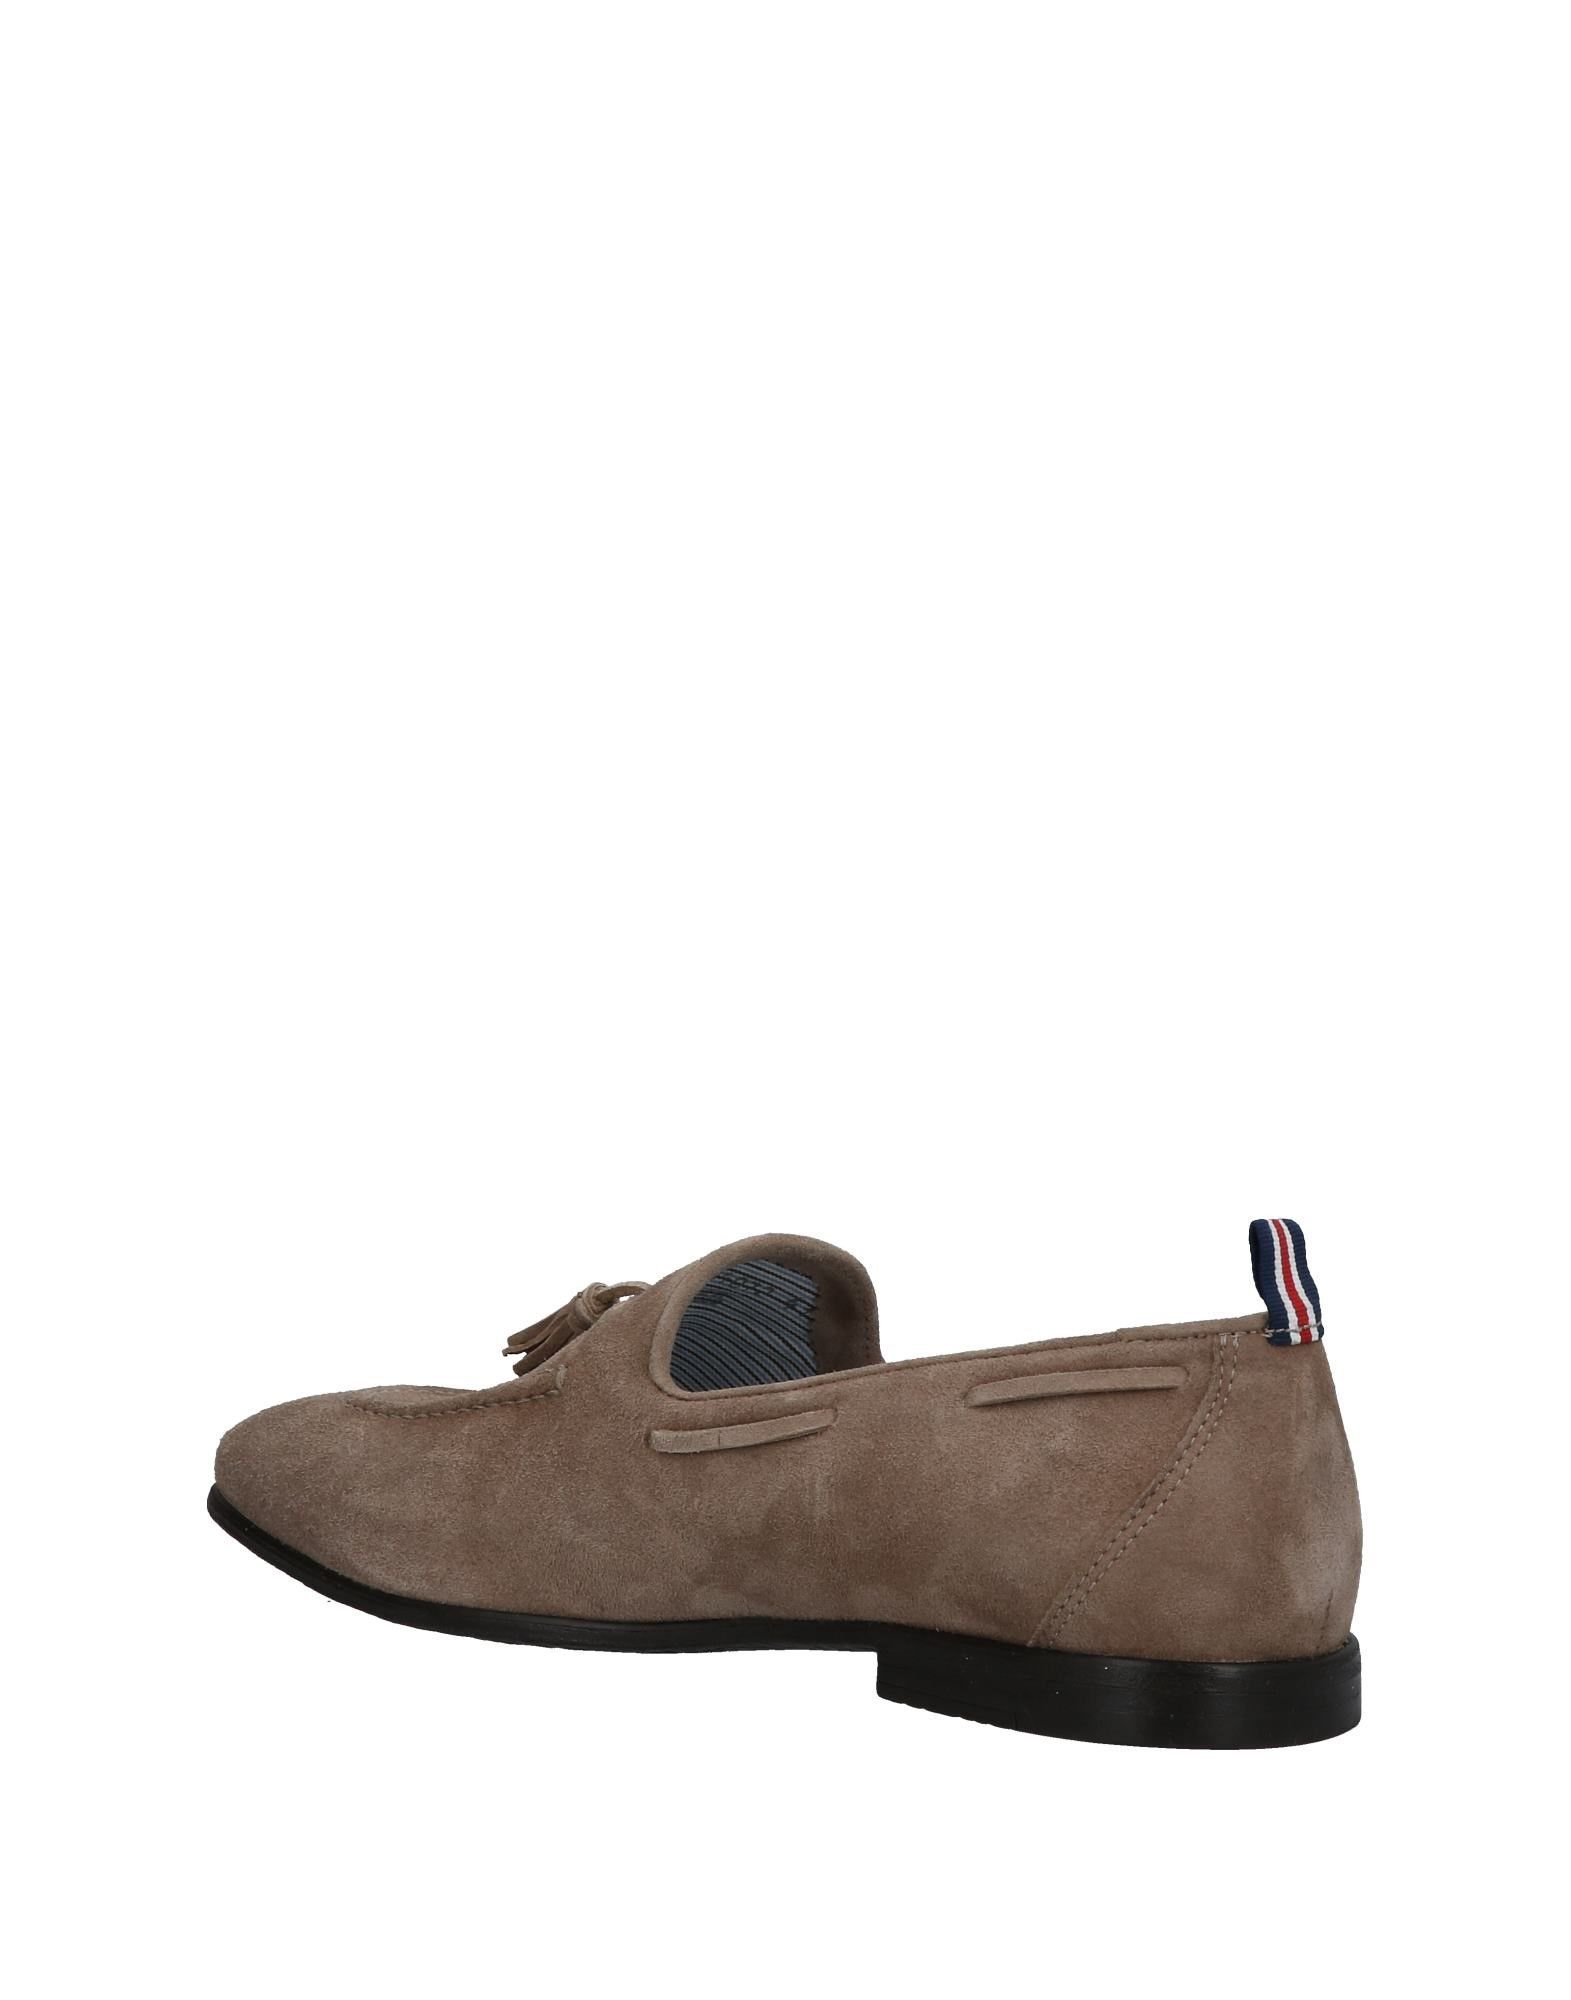 Docksteps Mokassins Schuhe Herren  11422134VI Heiße Schuhe Mokassins 407add